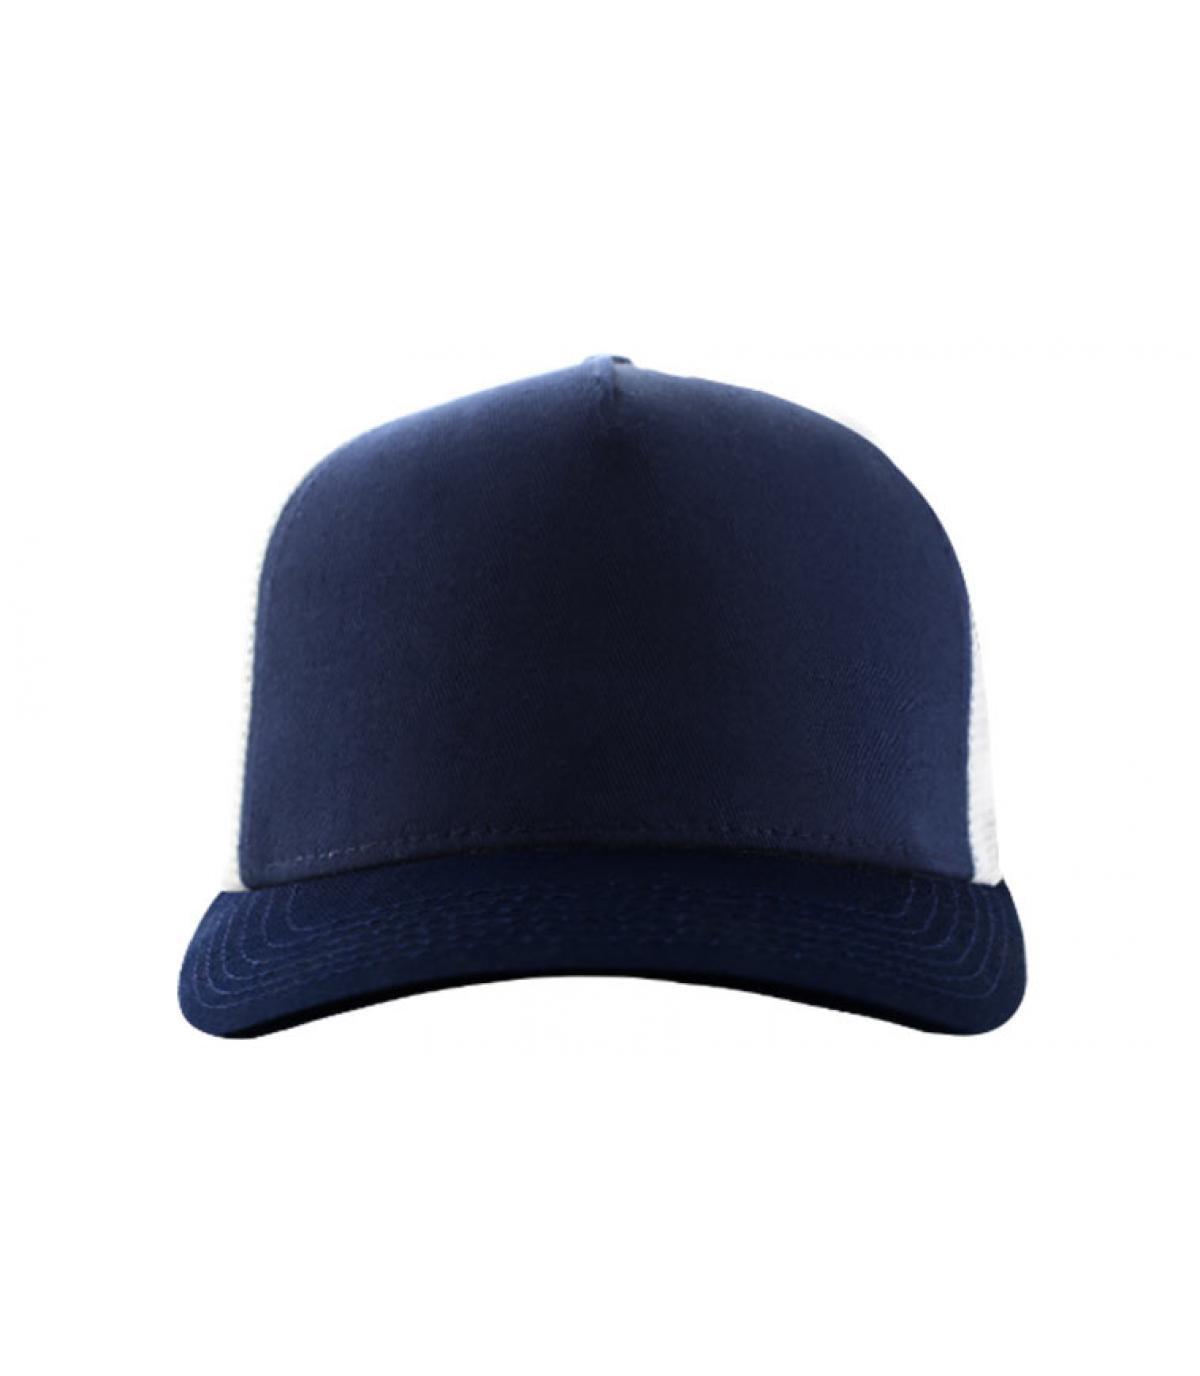 Trucker marineblau weiß